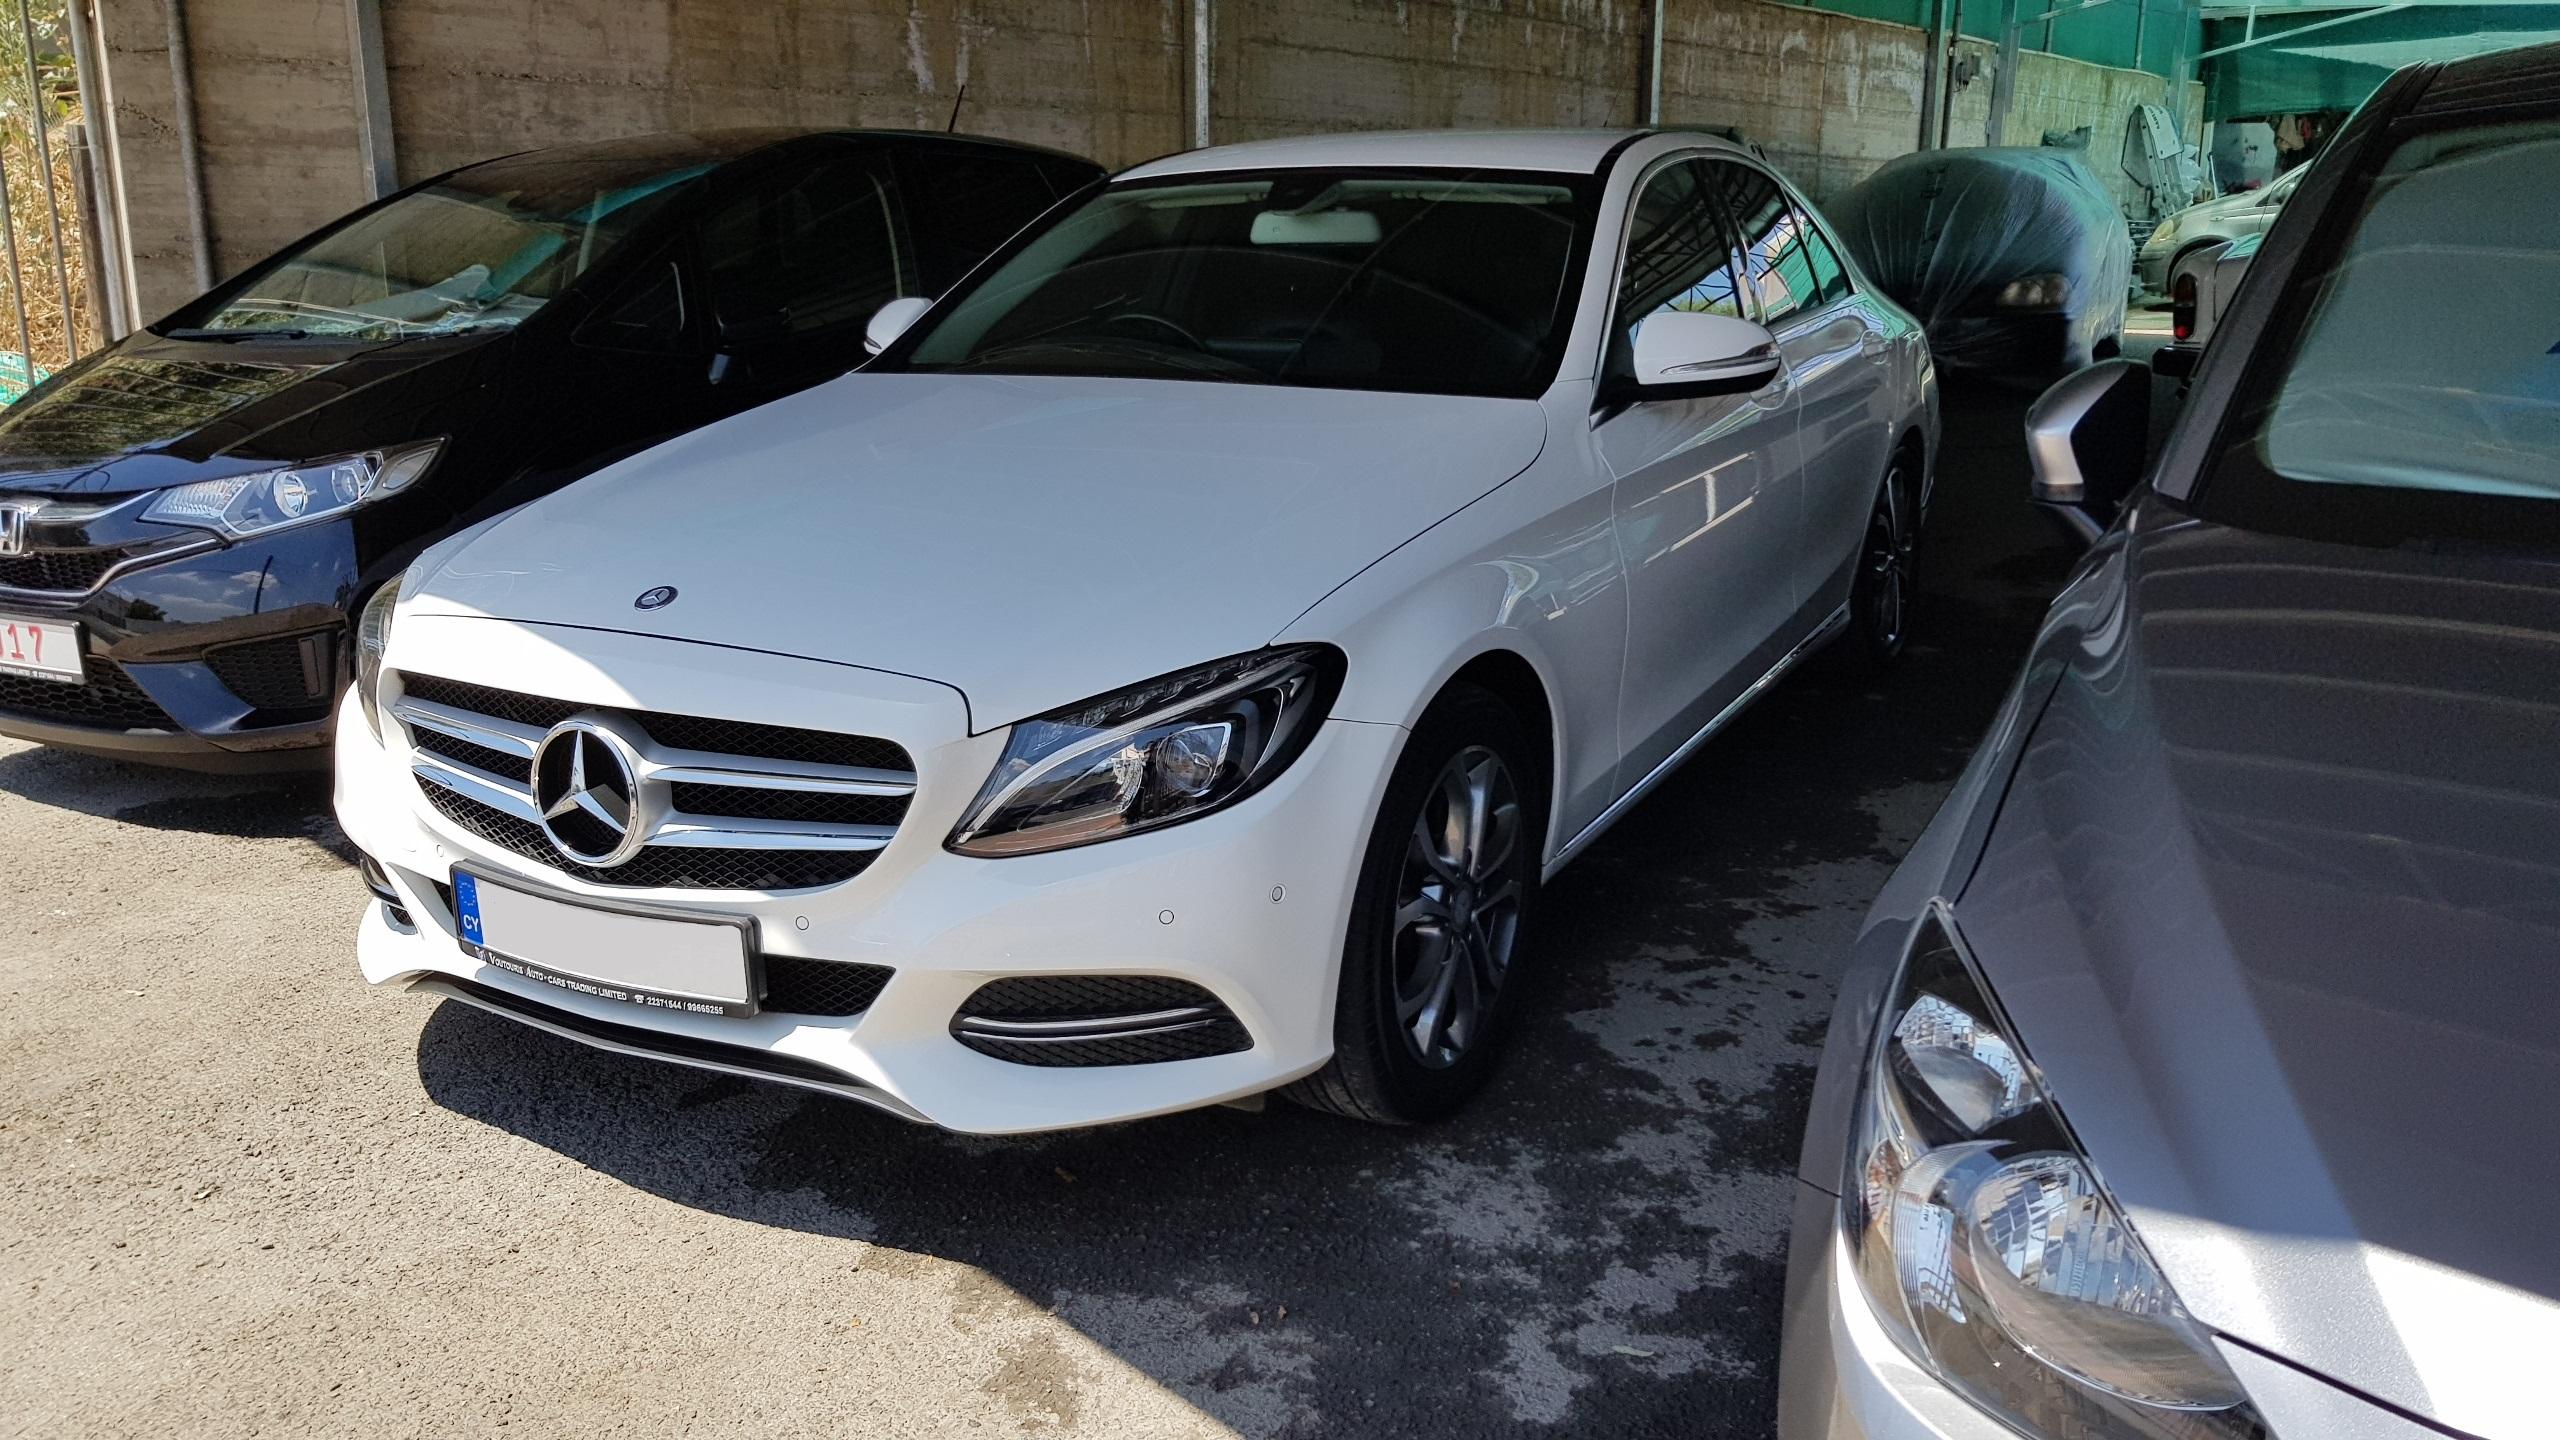 Mercedes C220 CDI White 03